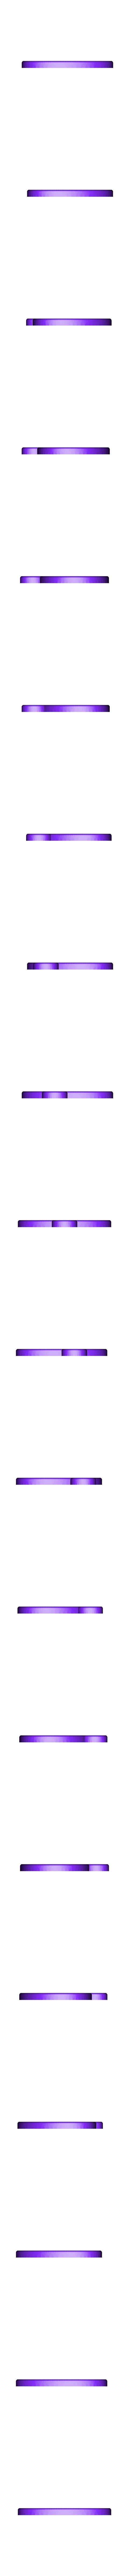 Dije X.STL Download STL file I said letter X • 3D print template, nldise